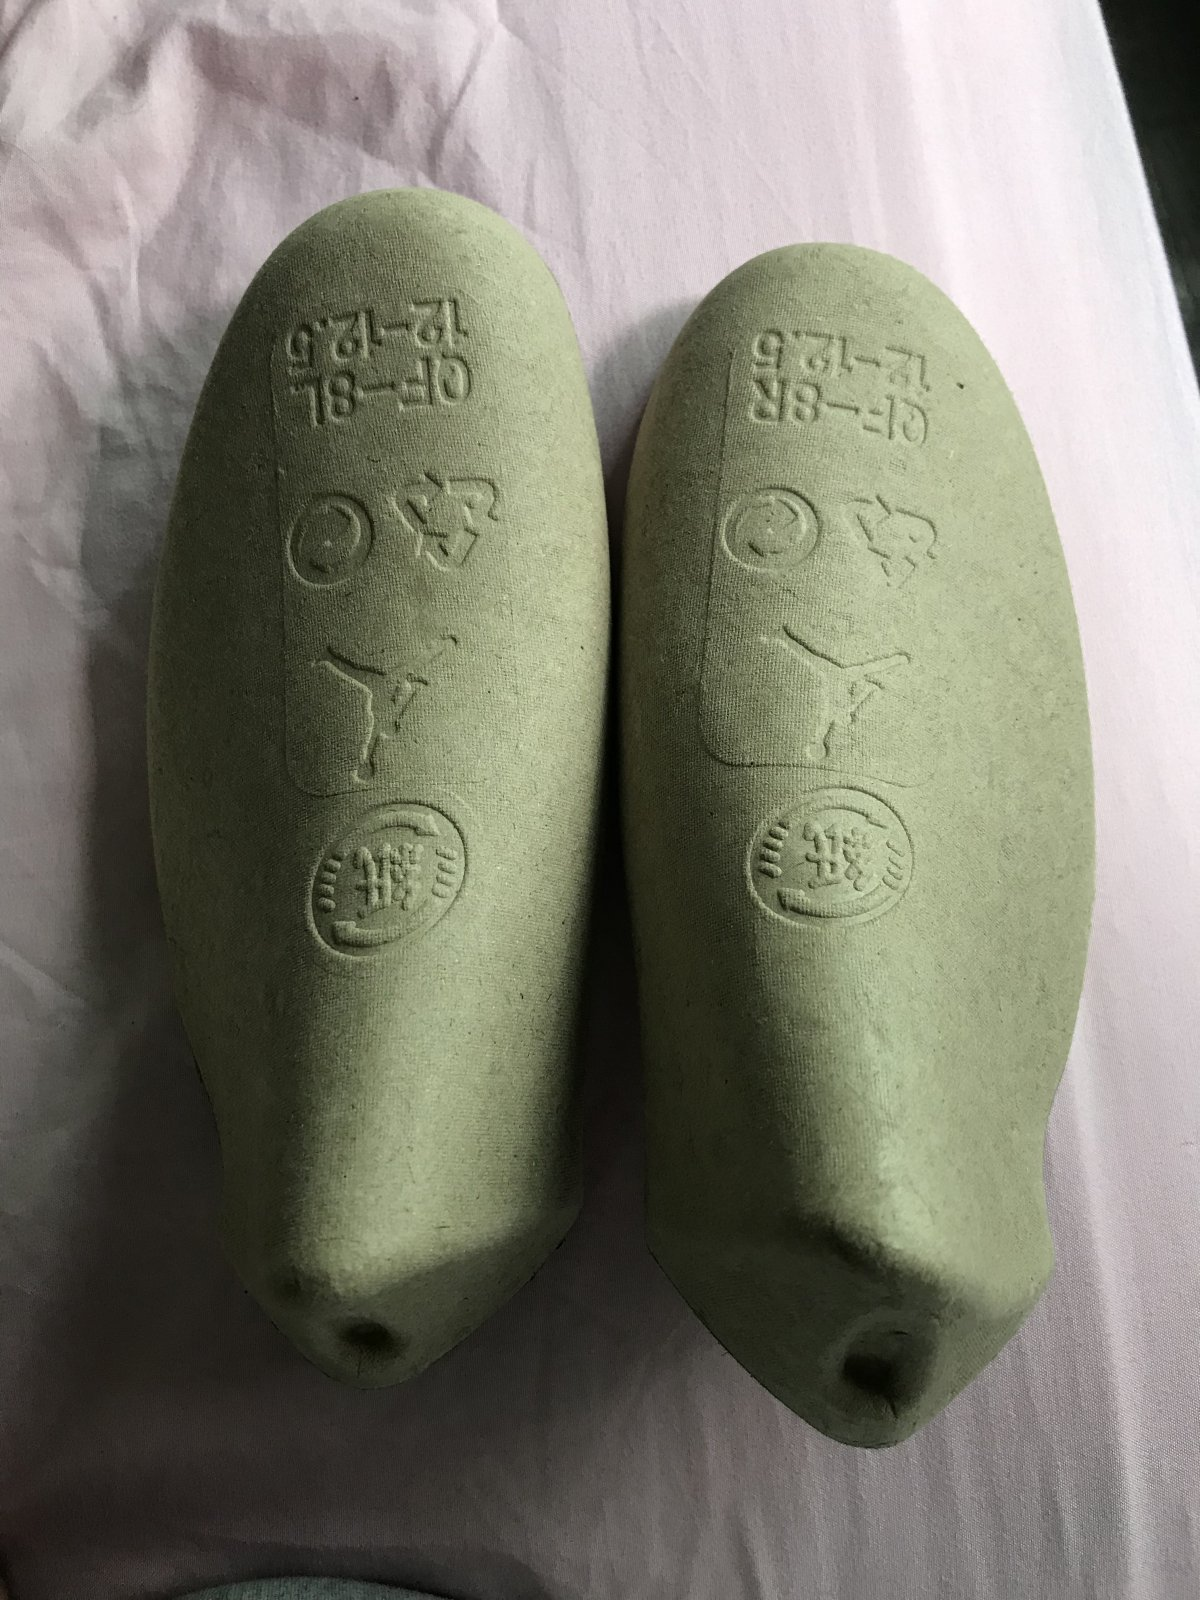 CEADB96A-1CB5-4B1D-8B2E-61214EDCFF61.jpeg